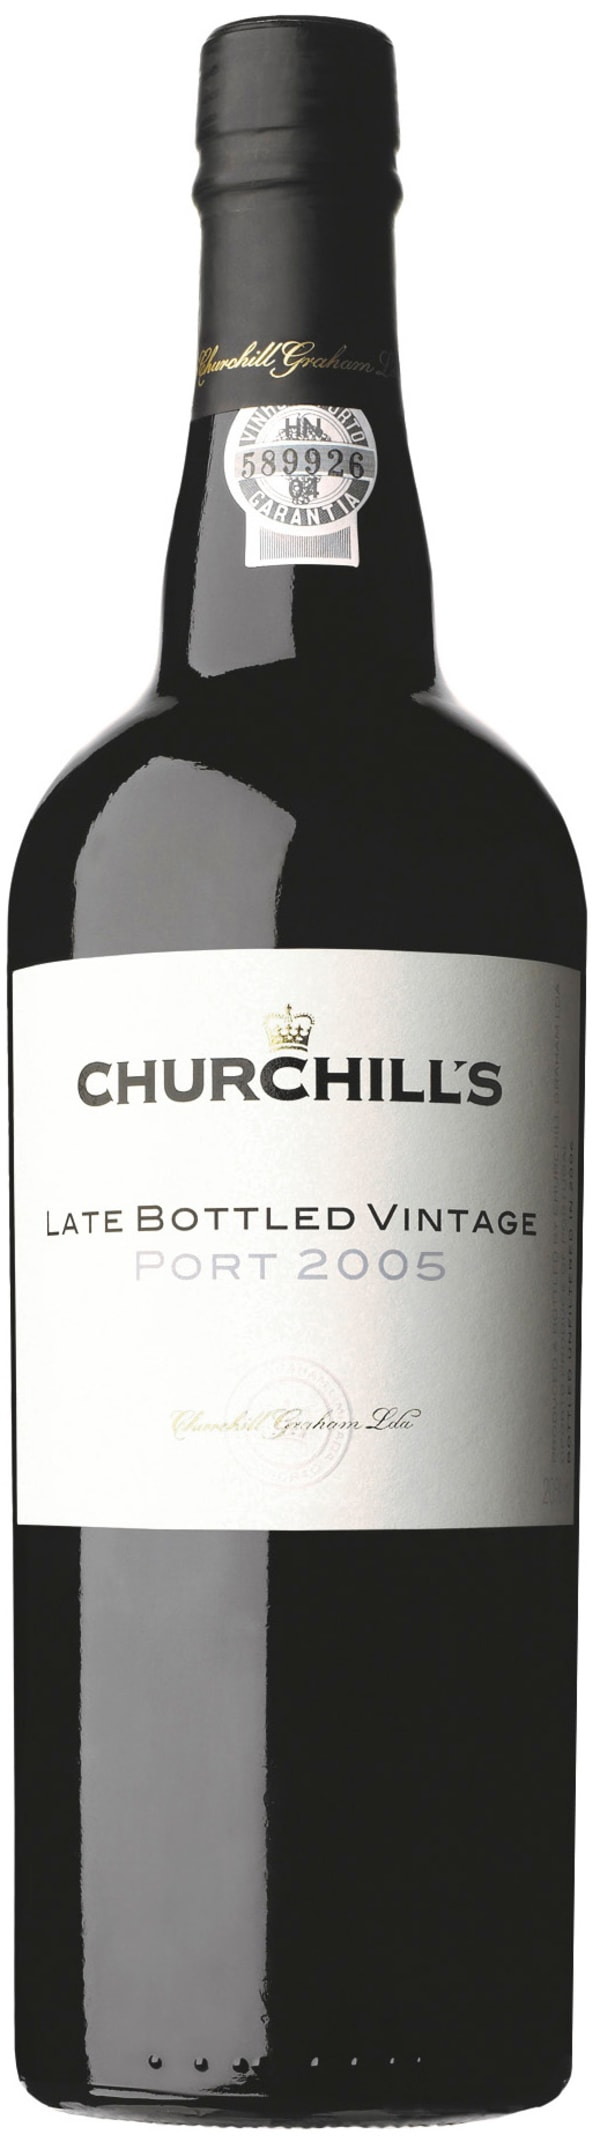 Churchill's LBV 2005